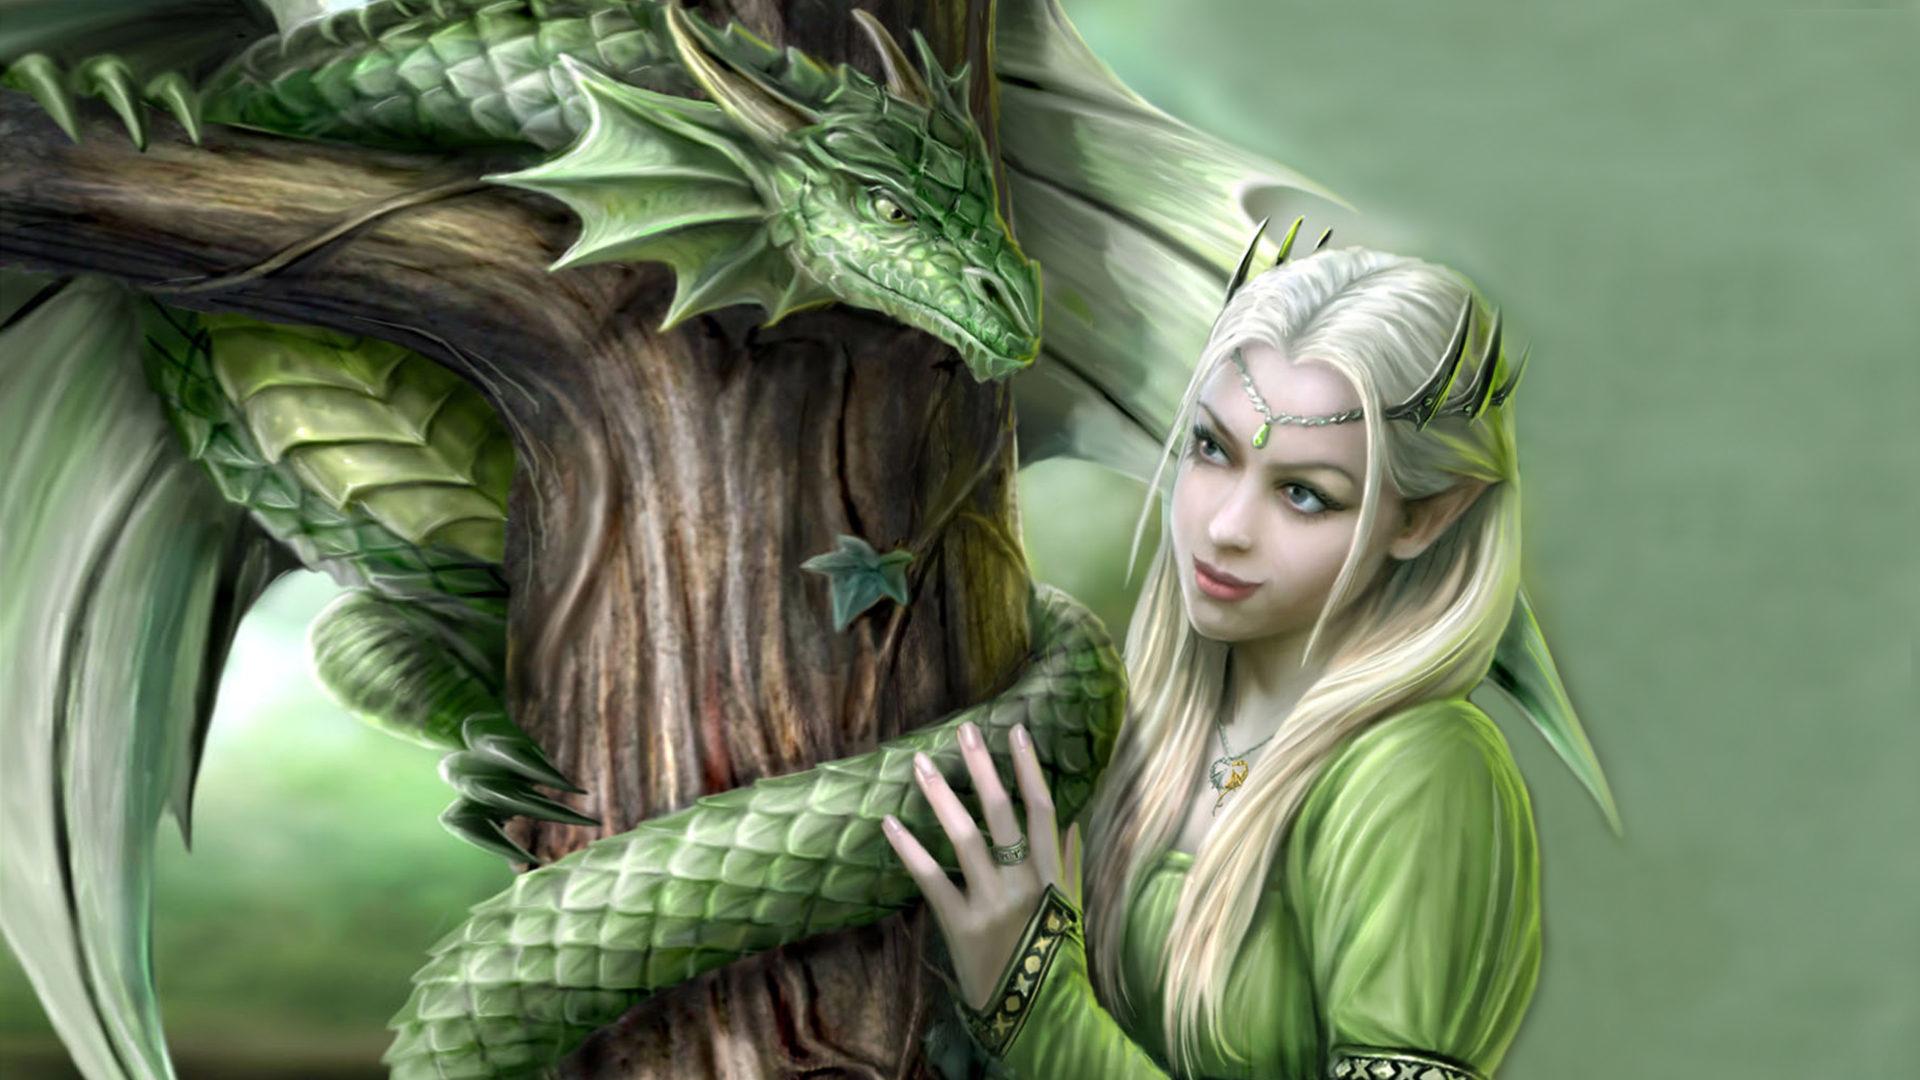 Genji Wallpaper Iphone Green Dragon And Princess Fantasy Digital Art Hd Desktop